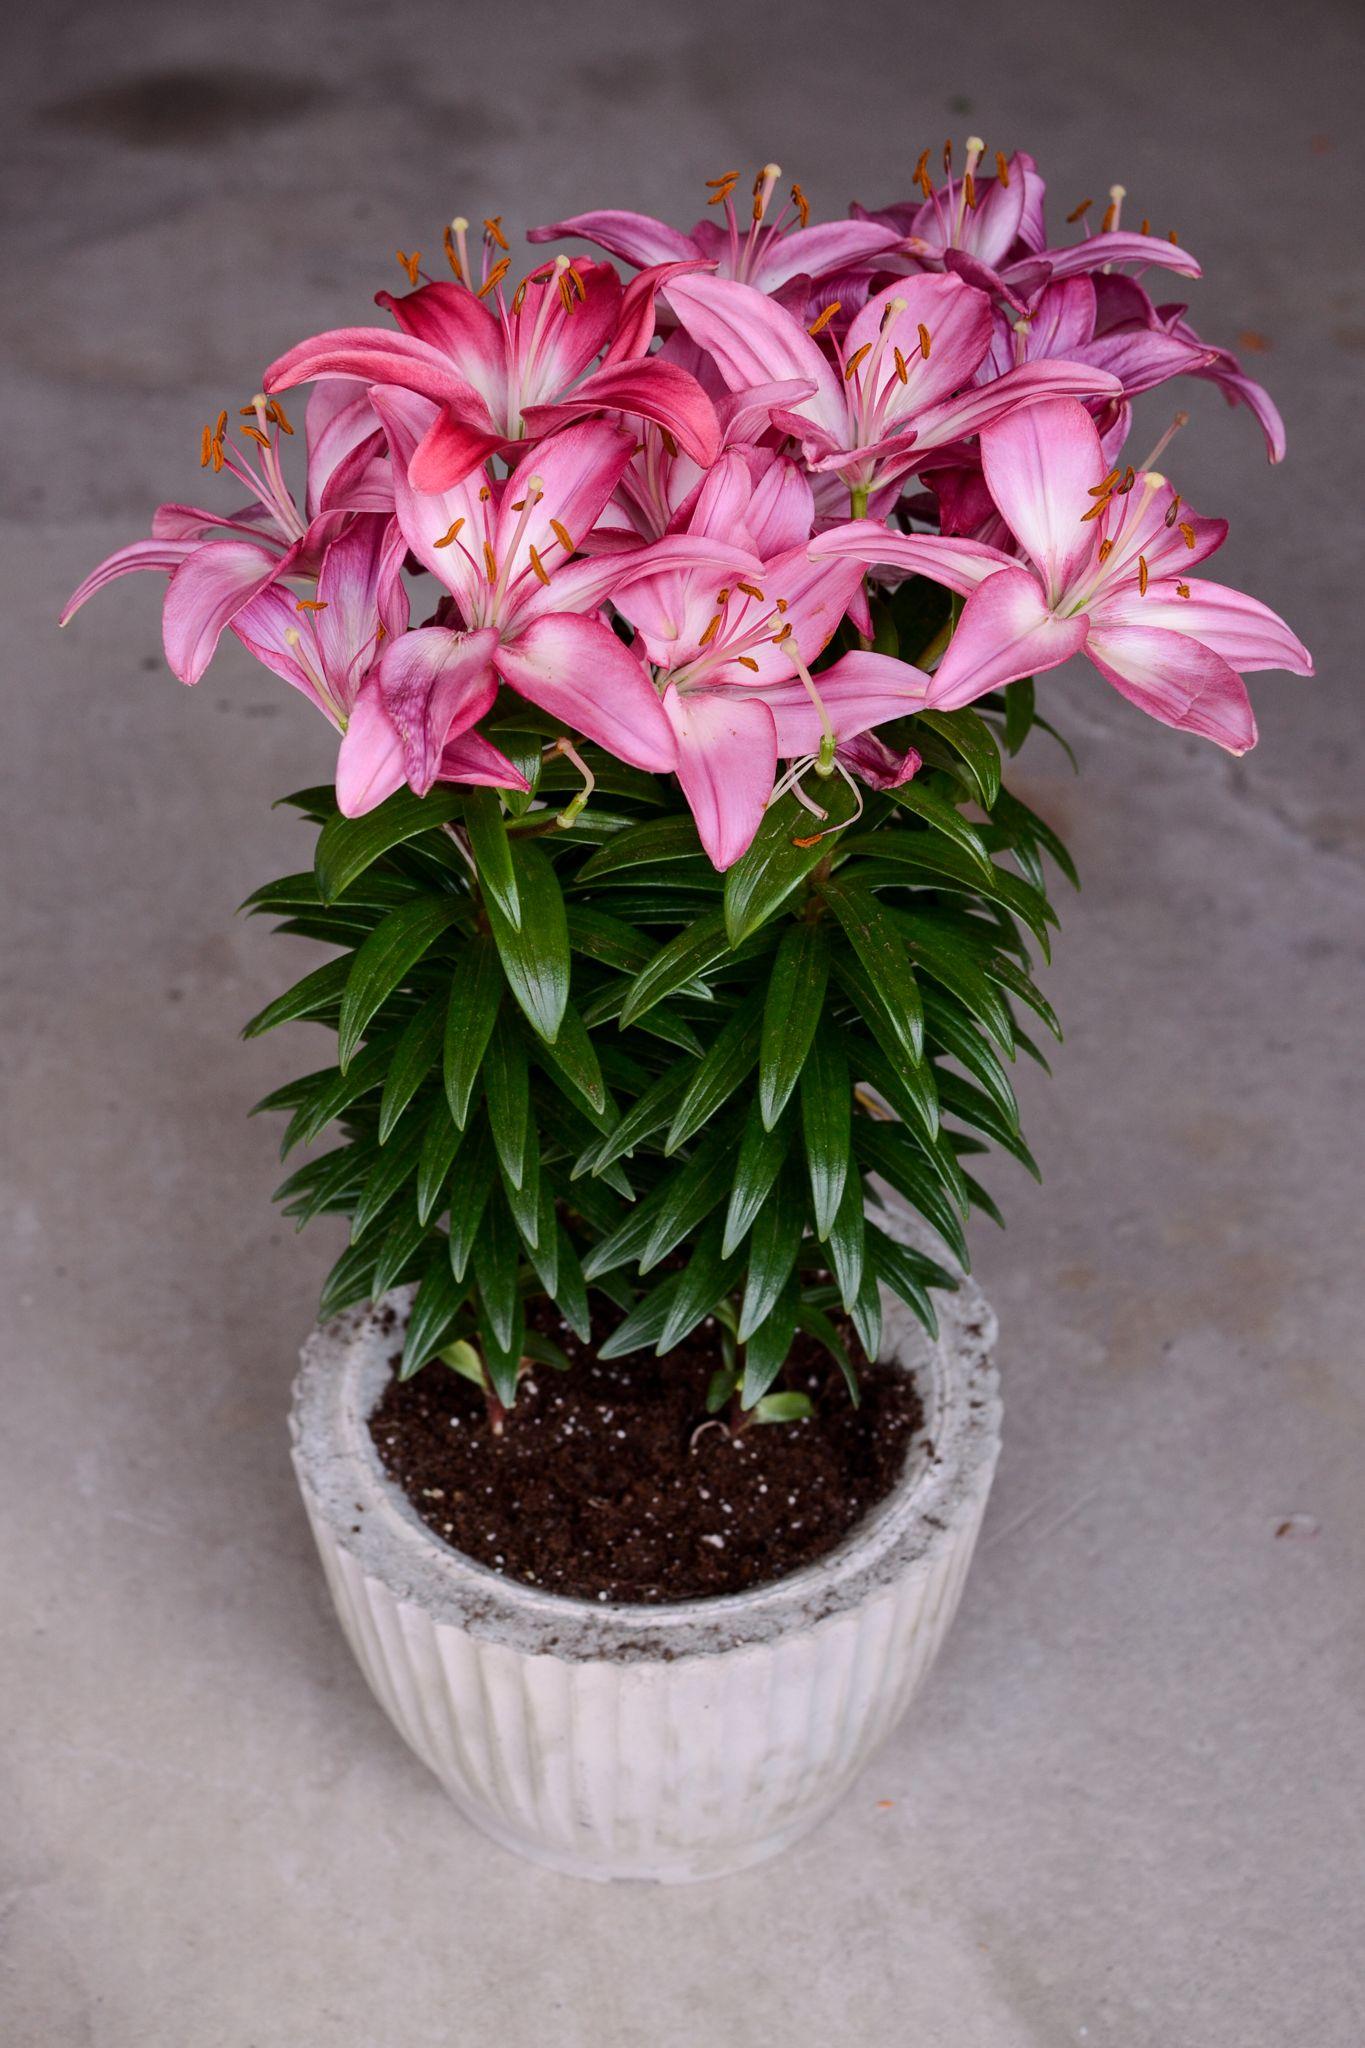 Castconcrete flower pot everyday brandy flower pots